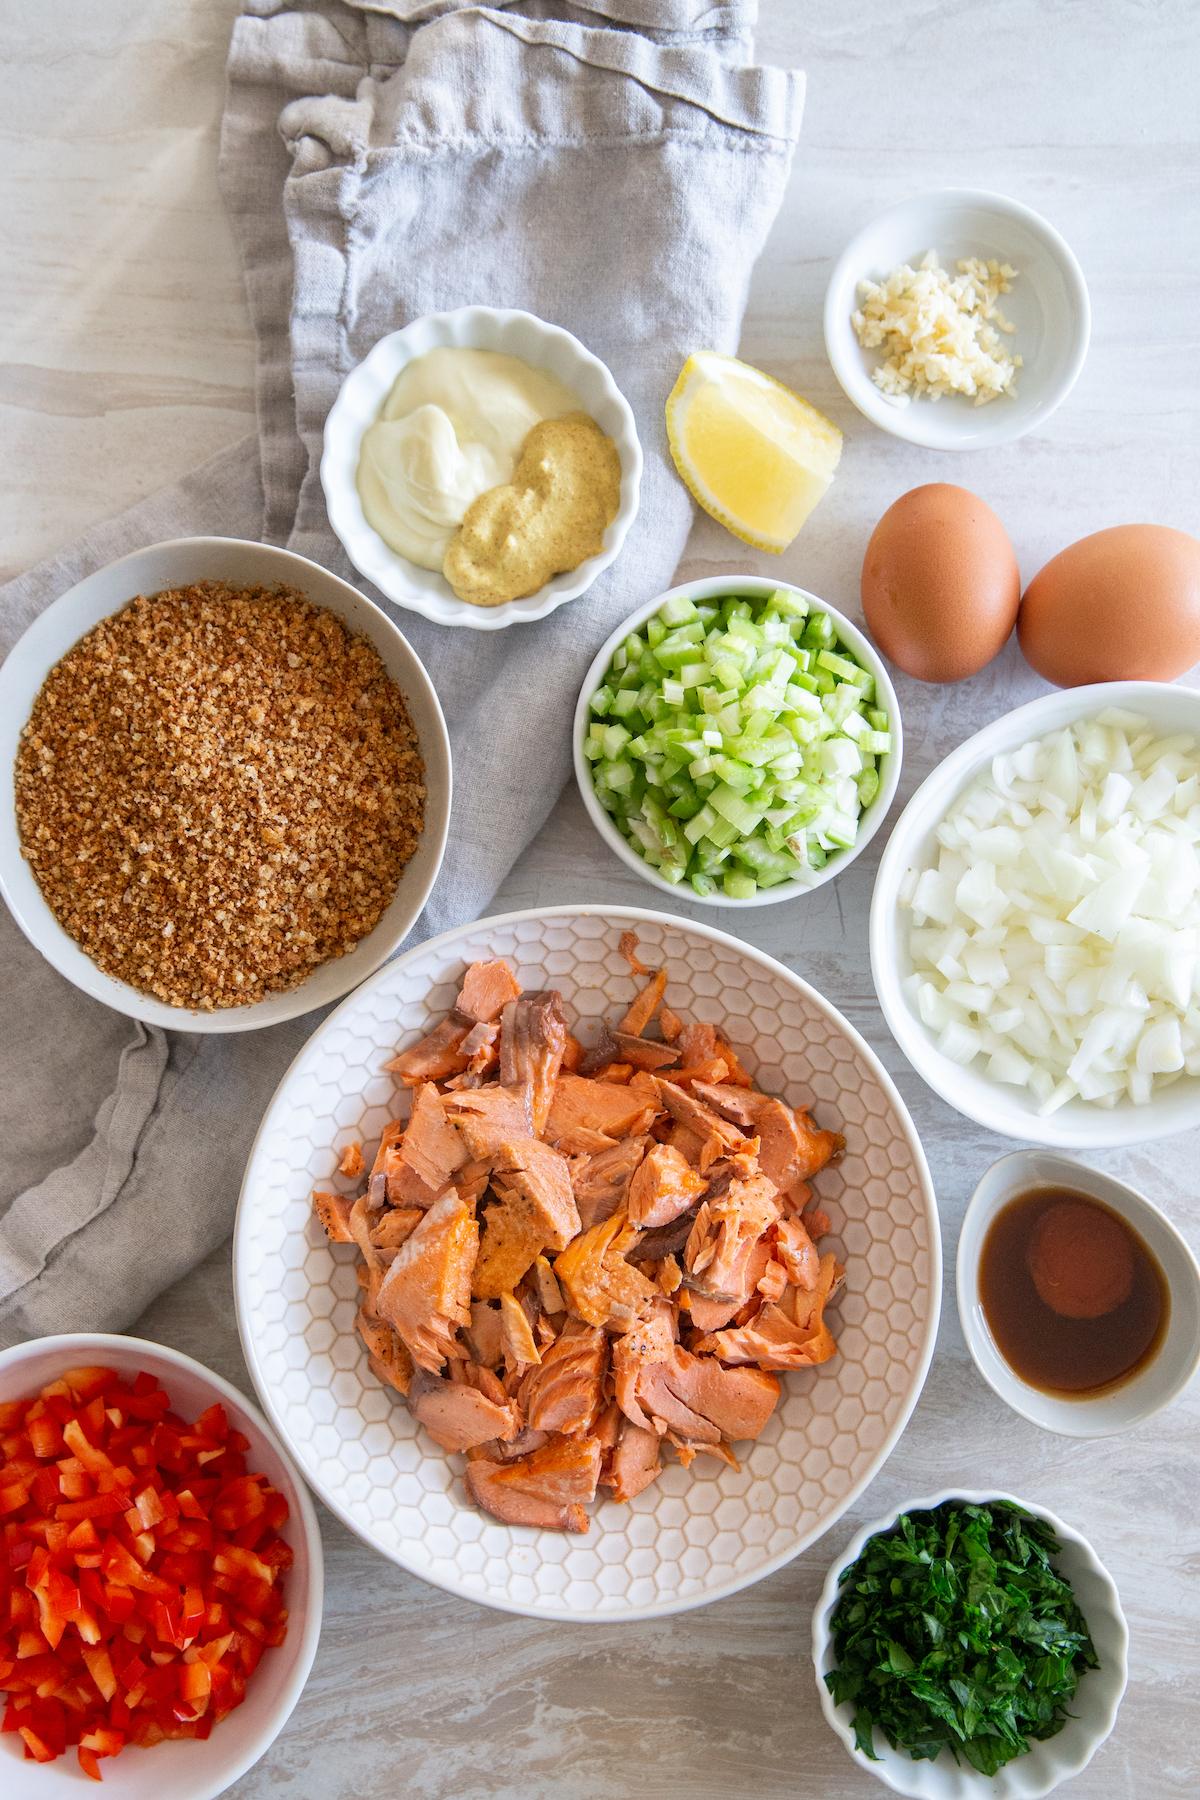 Ingredients for salmon patties.